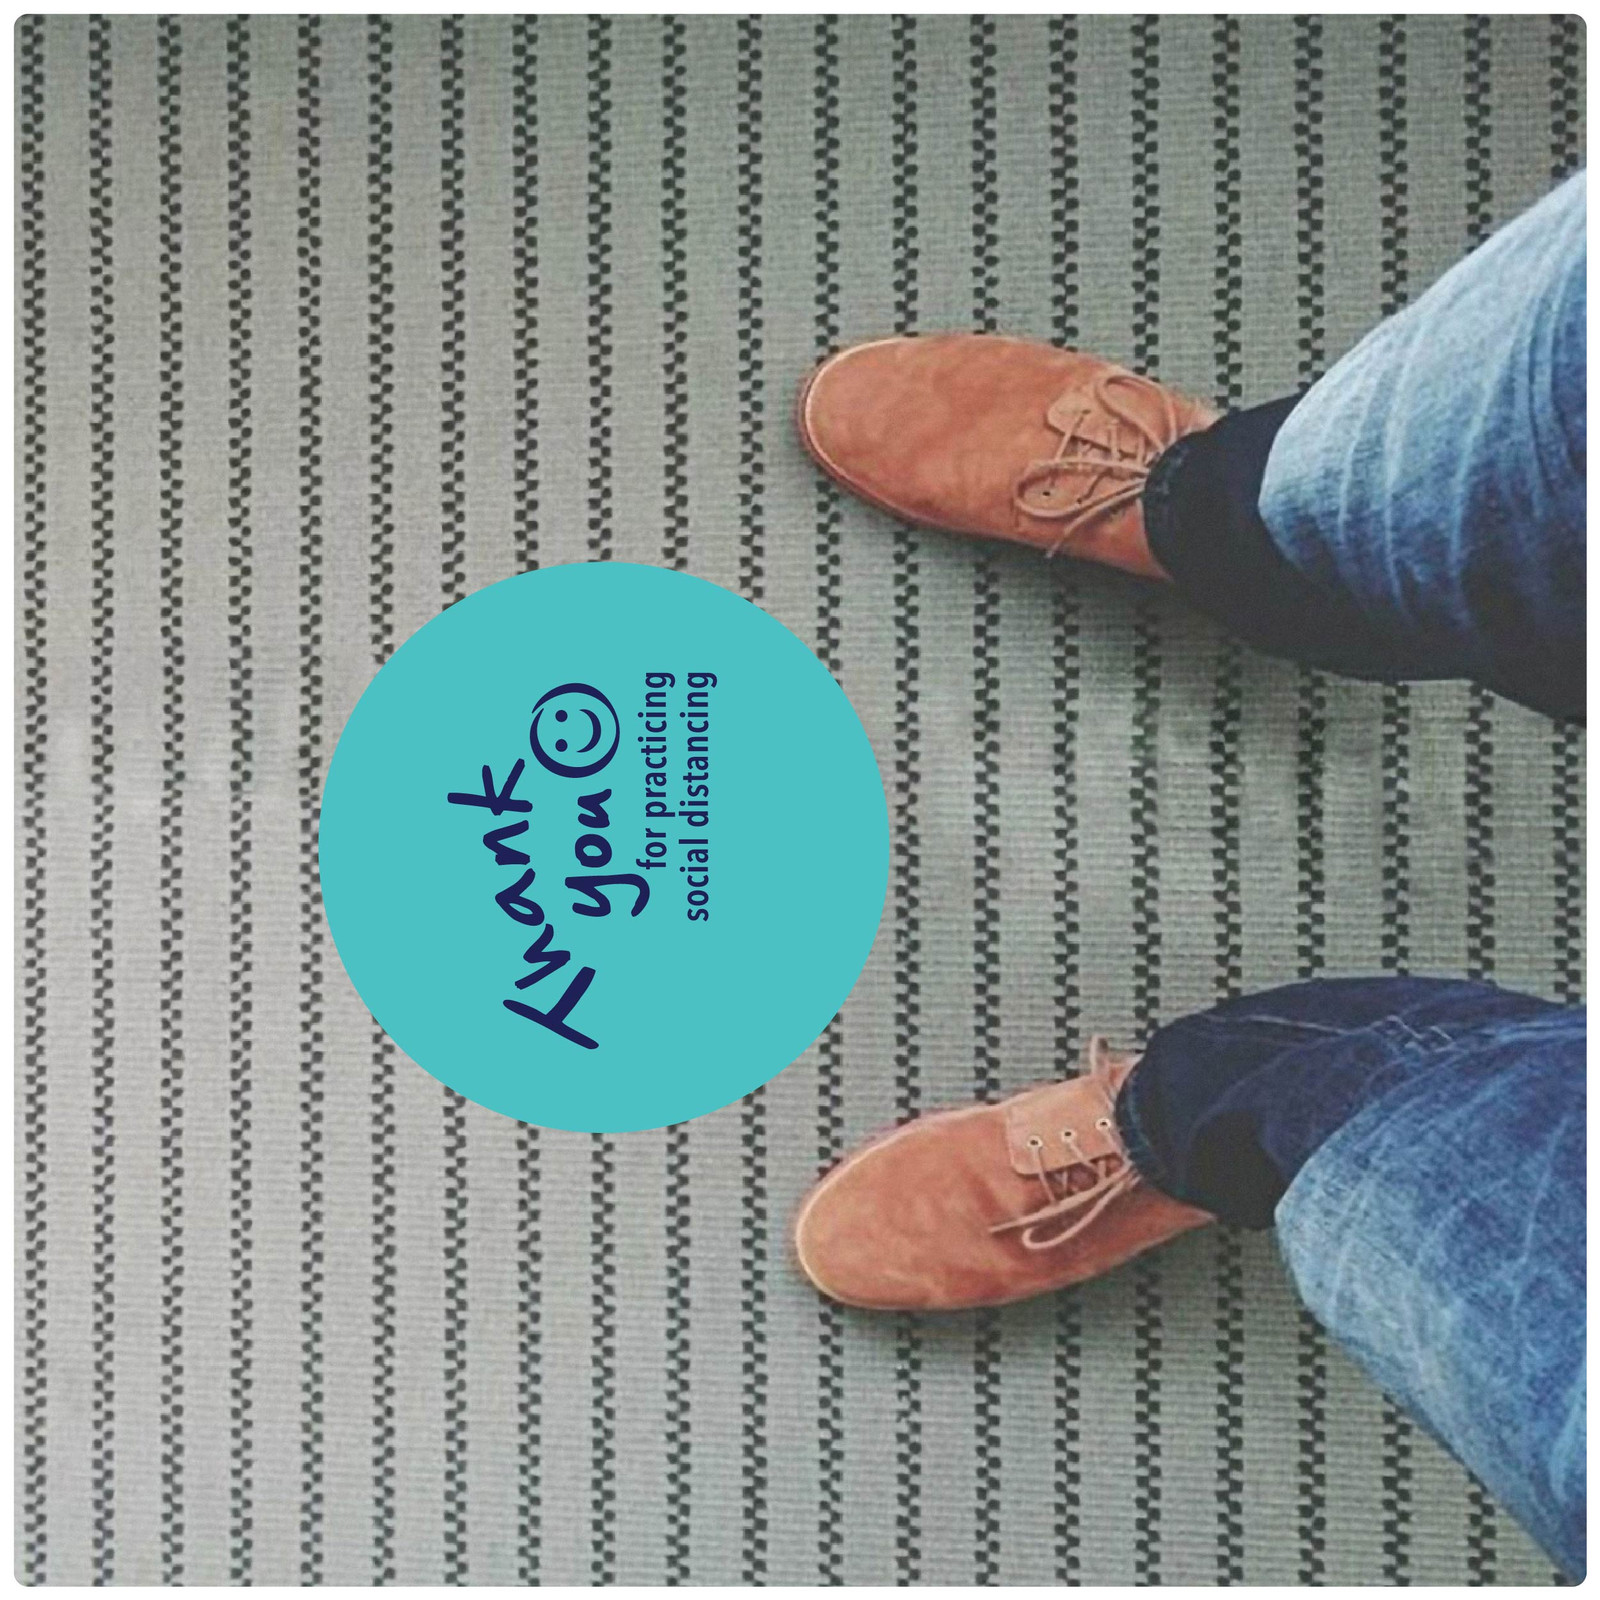 social distancing floor marker for carpet, photo, teal Self-adhesive Corona virus floor marker to help social distancing